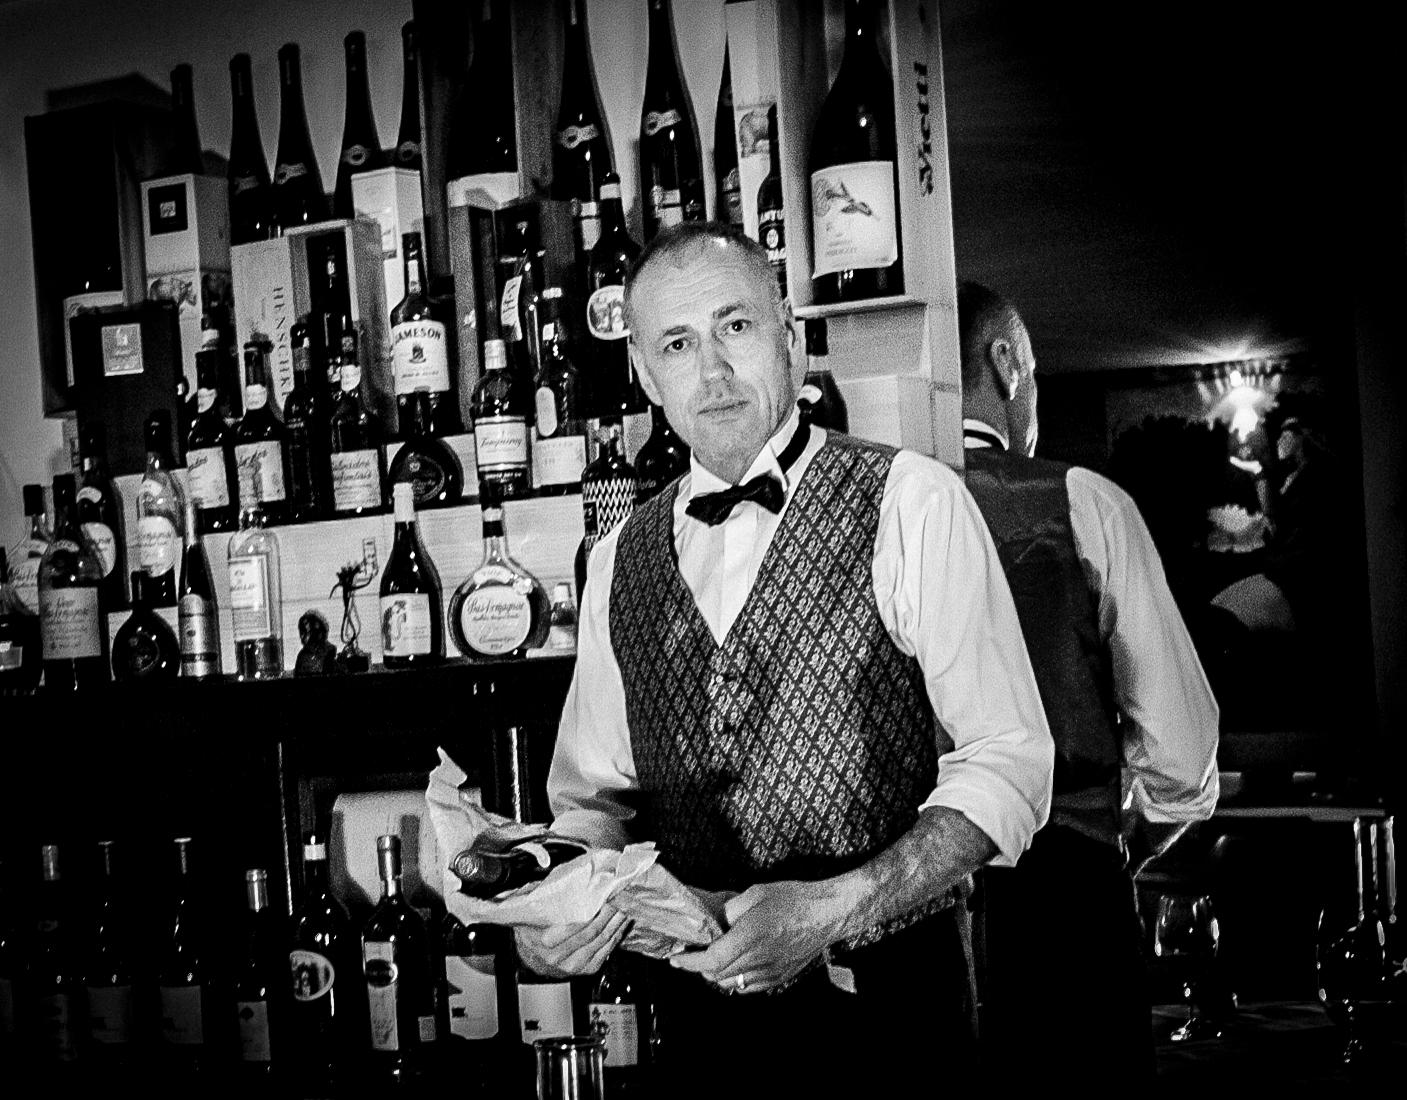 Sabrina van den Heuvel Photography-Shoot Hans Restaurant 23-02-2019-04.jpg